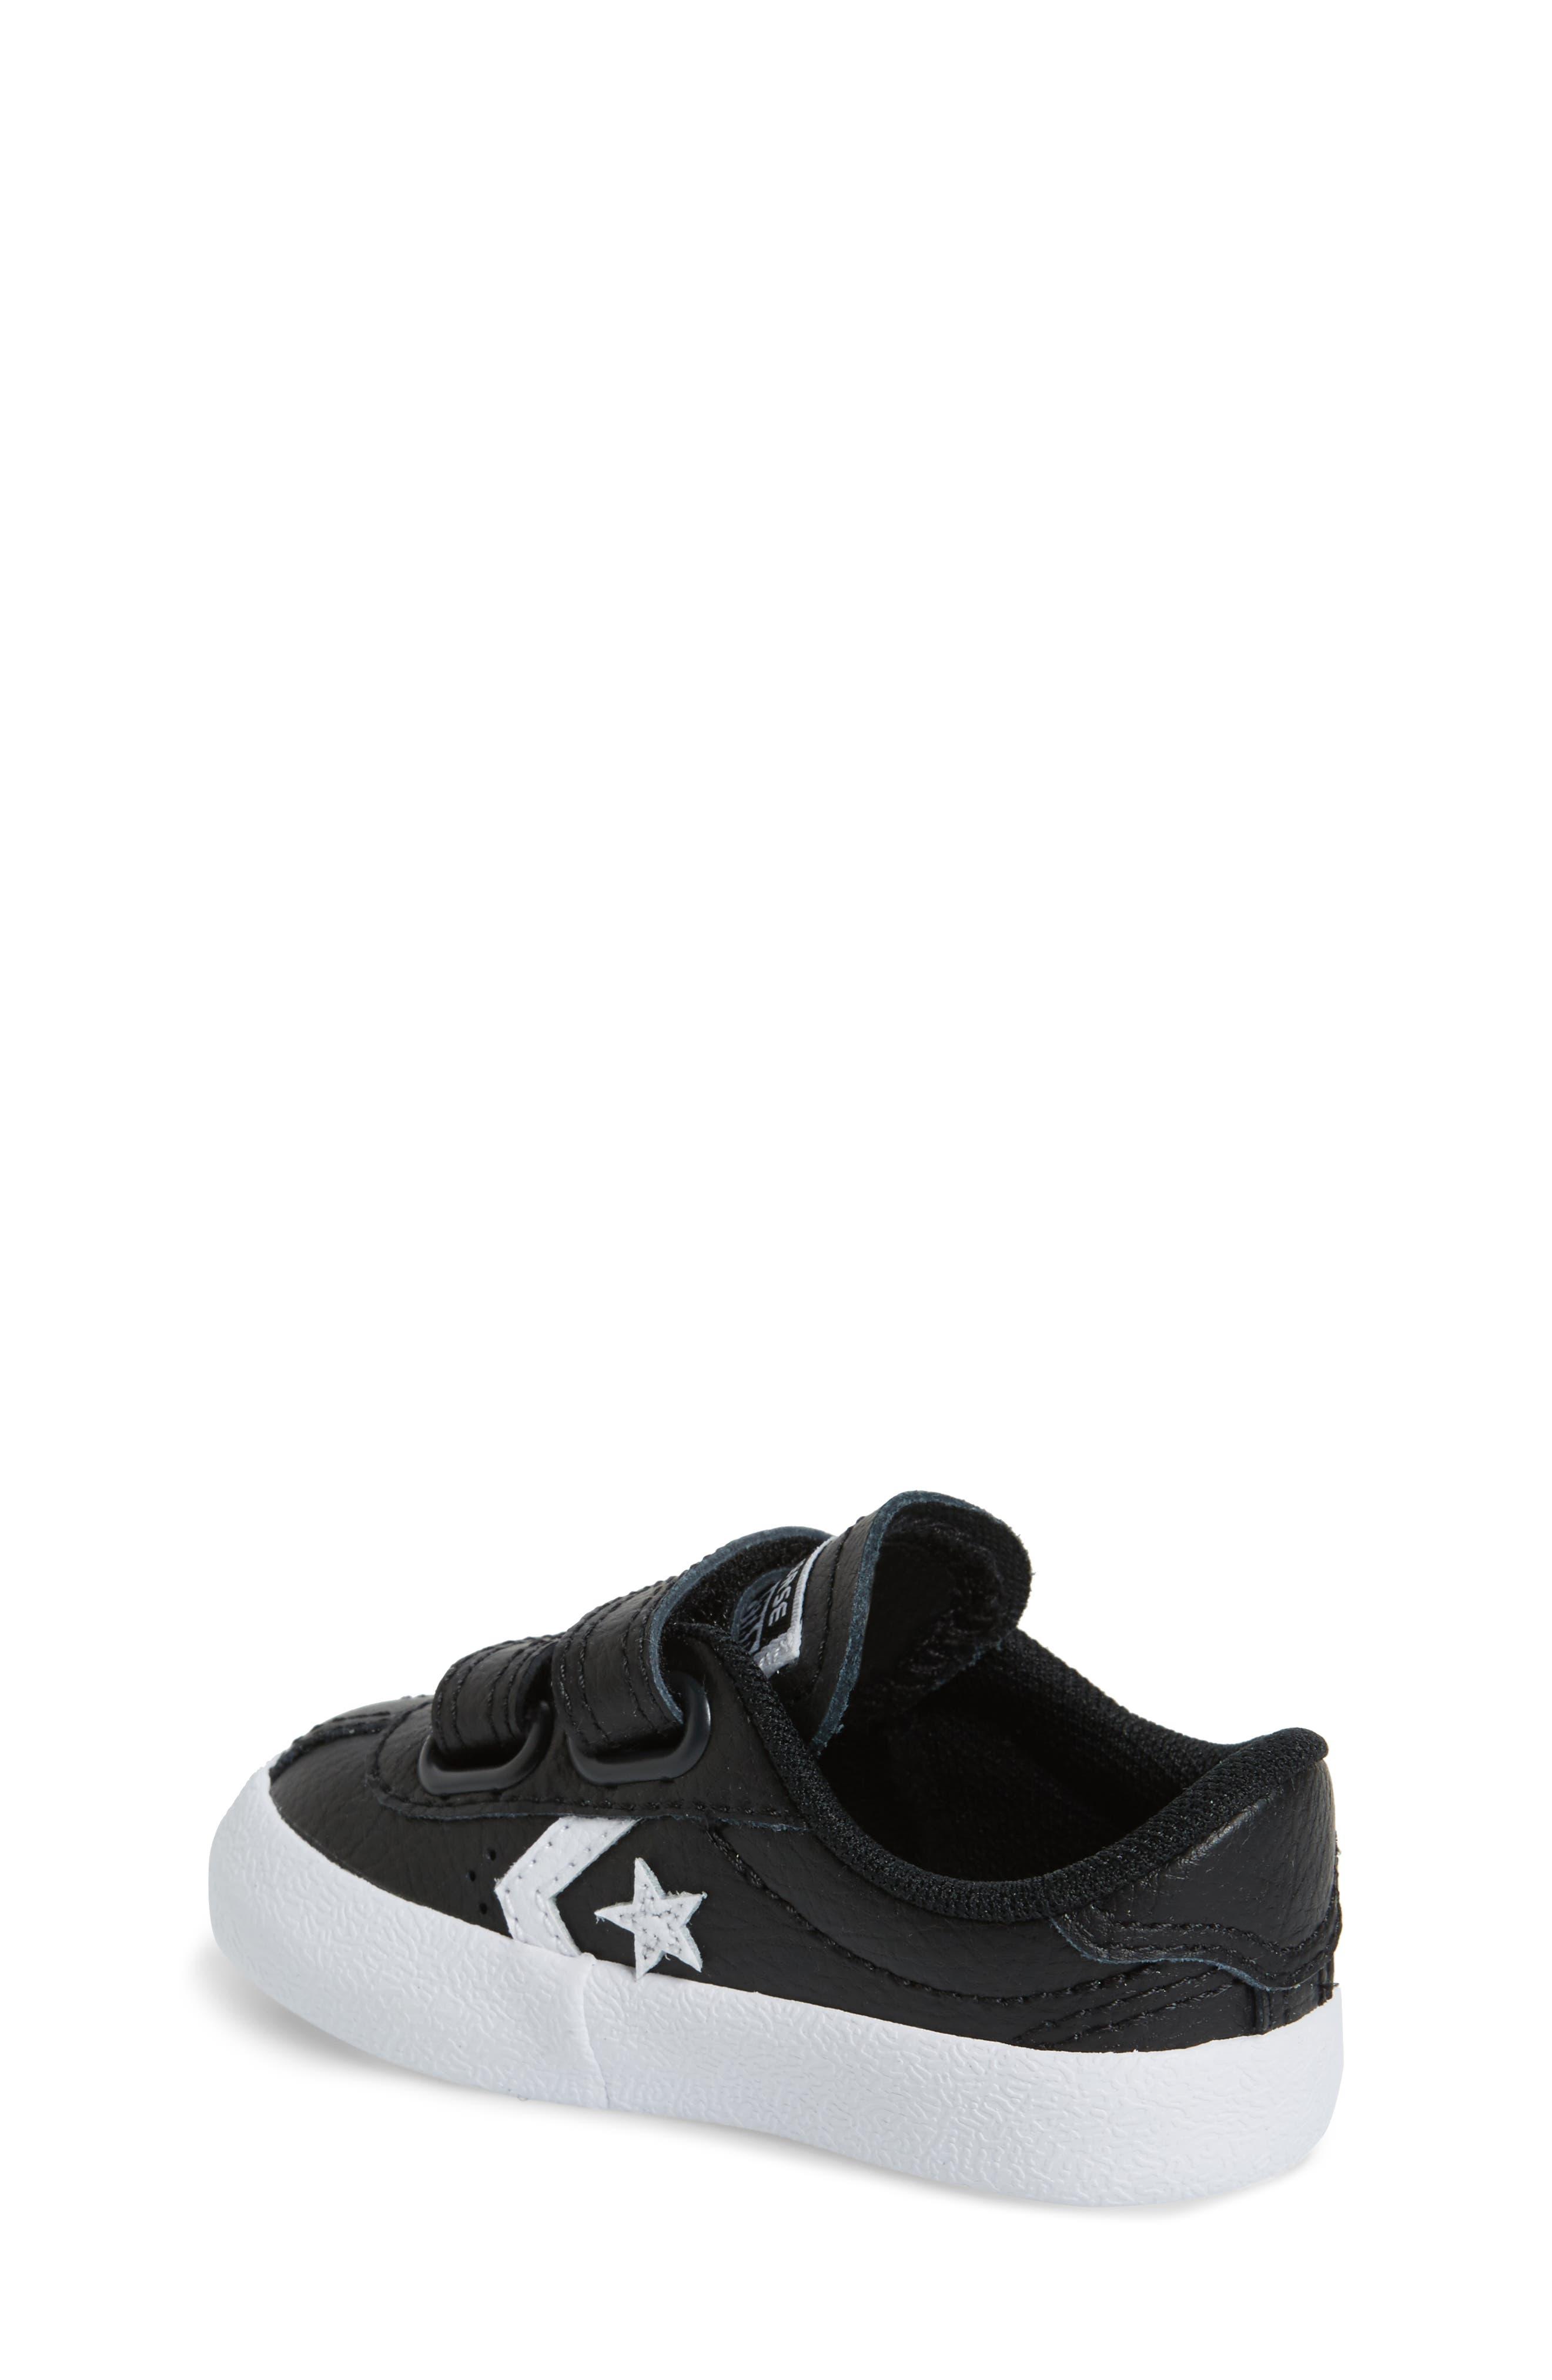 Breakpoint Pro Sneaker,                             Alternate thumbnail 2, color,                             001